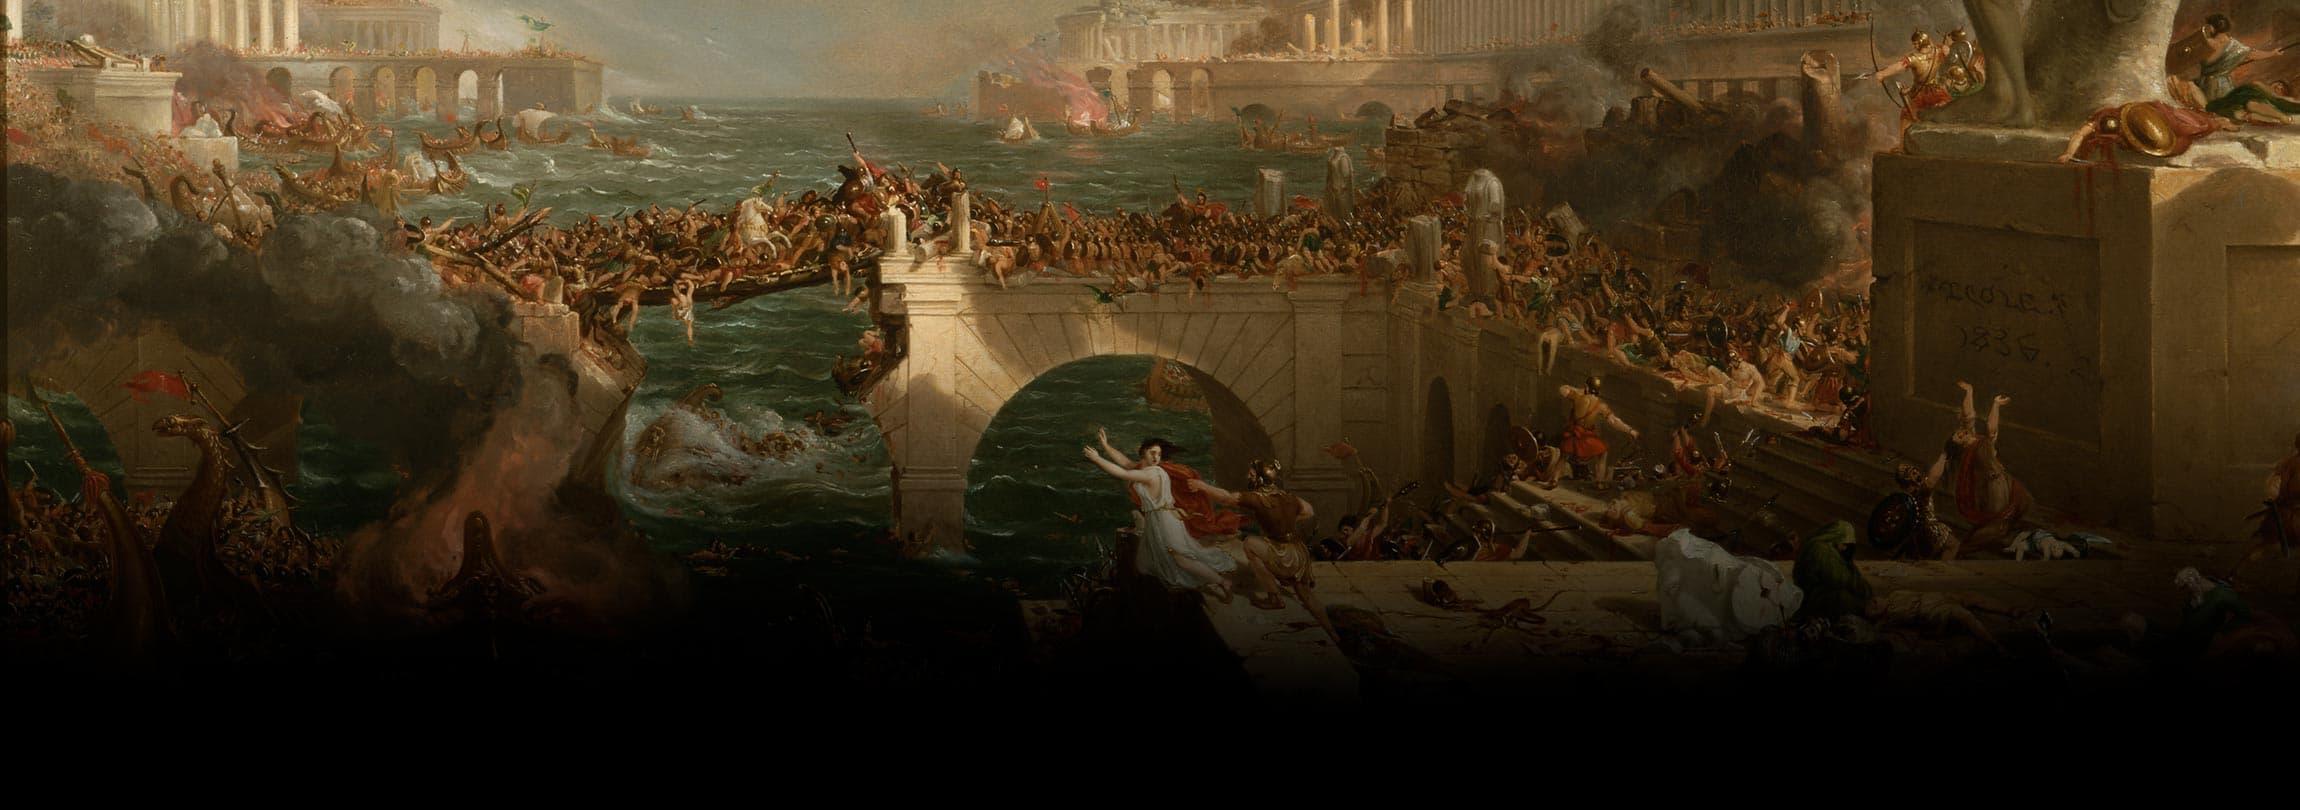 Os tempos de hoje, como nos tempos de Roma